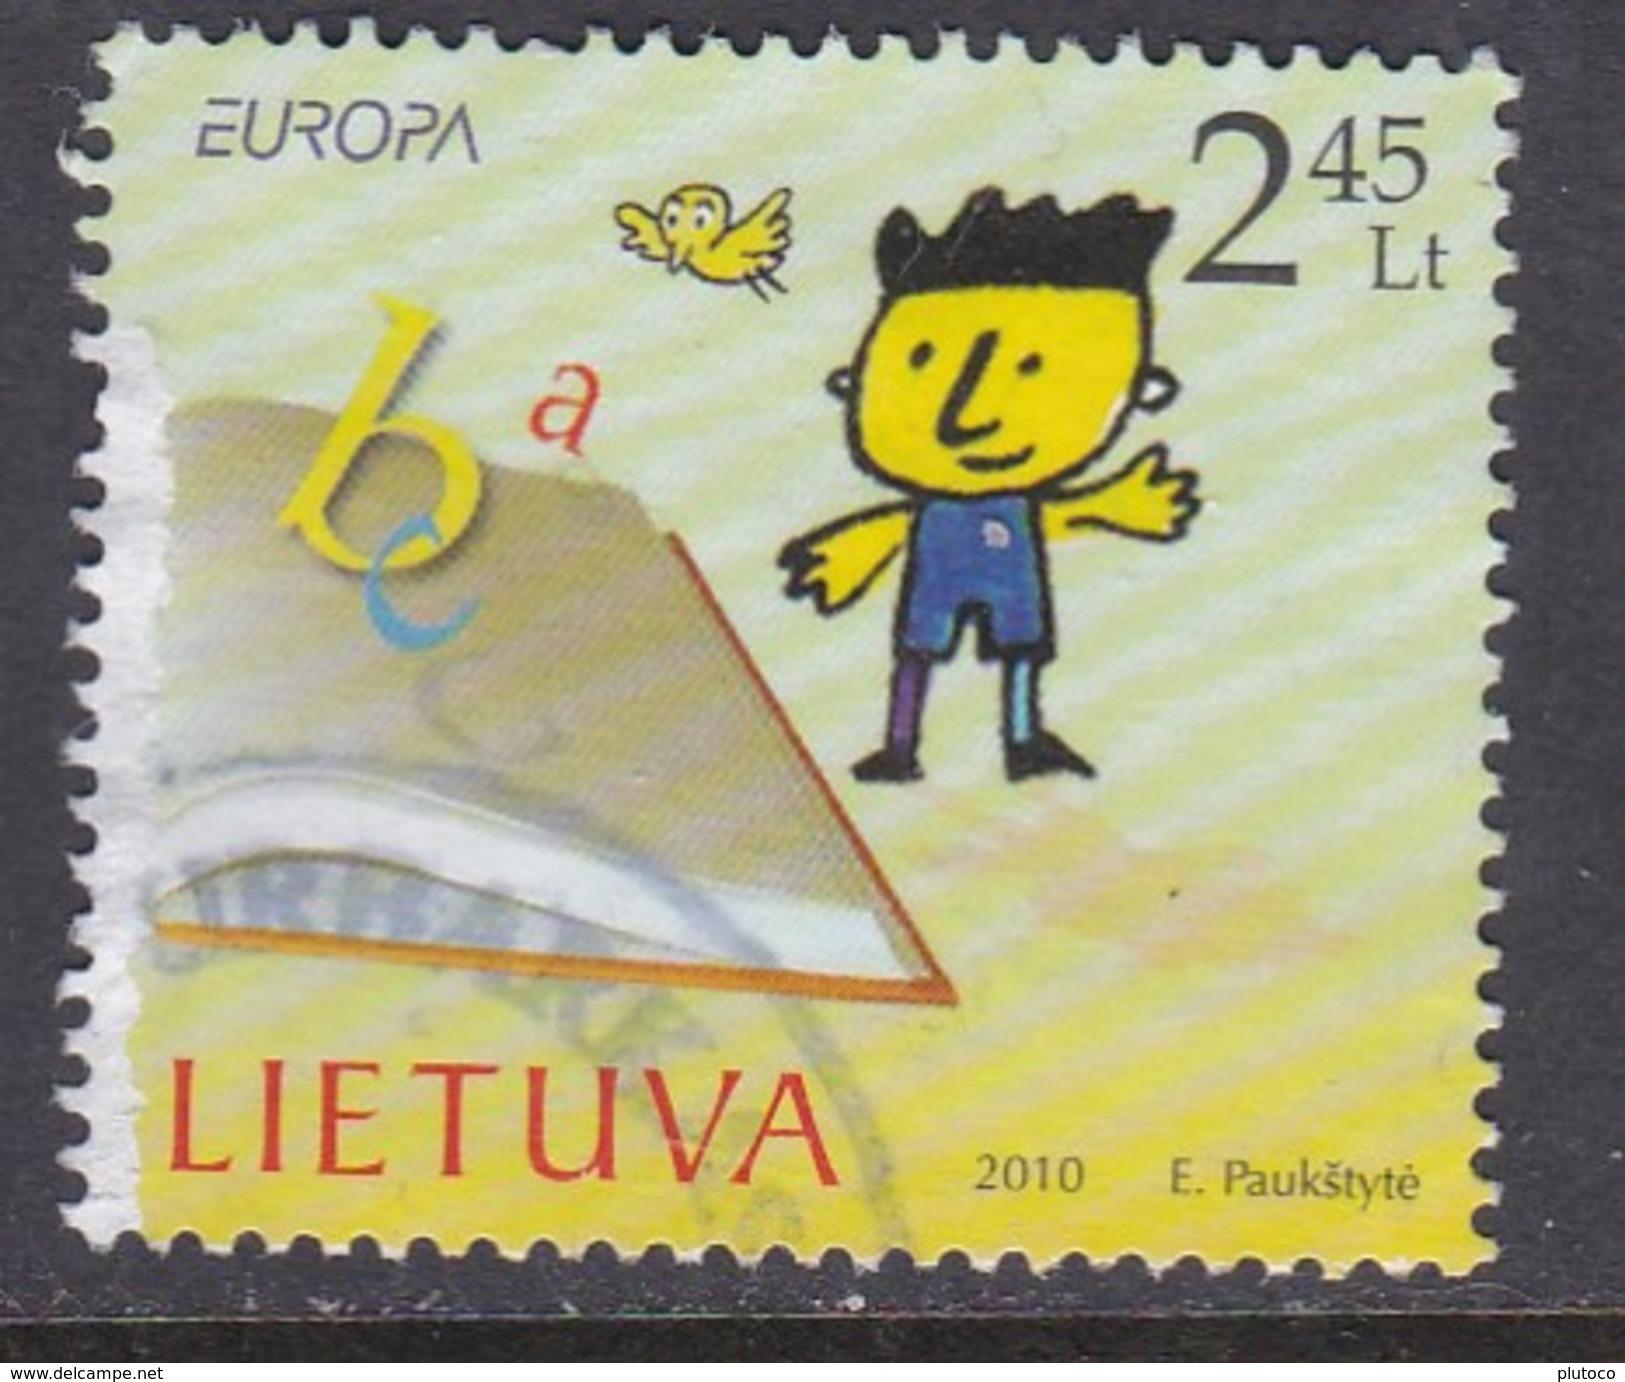 LITUANIA, USED STAMP, OBLITERÉ, SELLO USADO, EUROPA CEPT - Lithuania